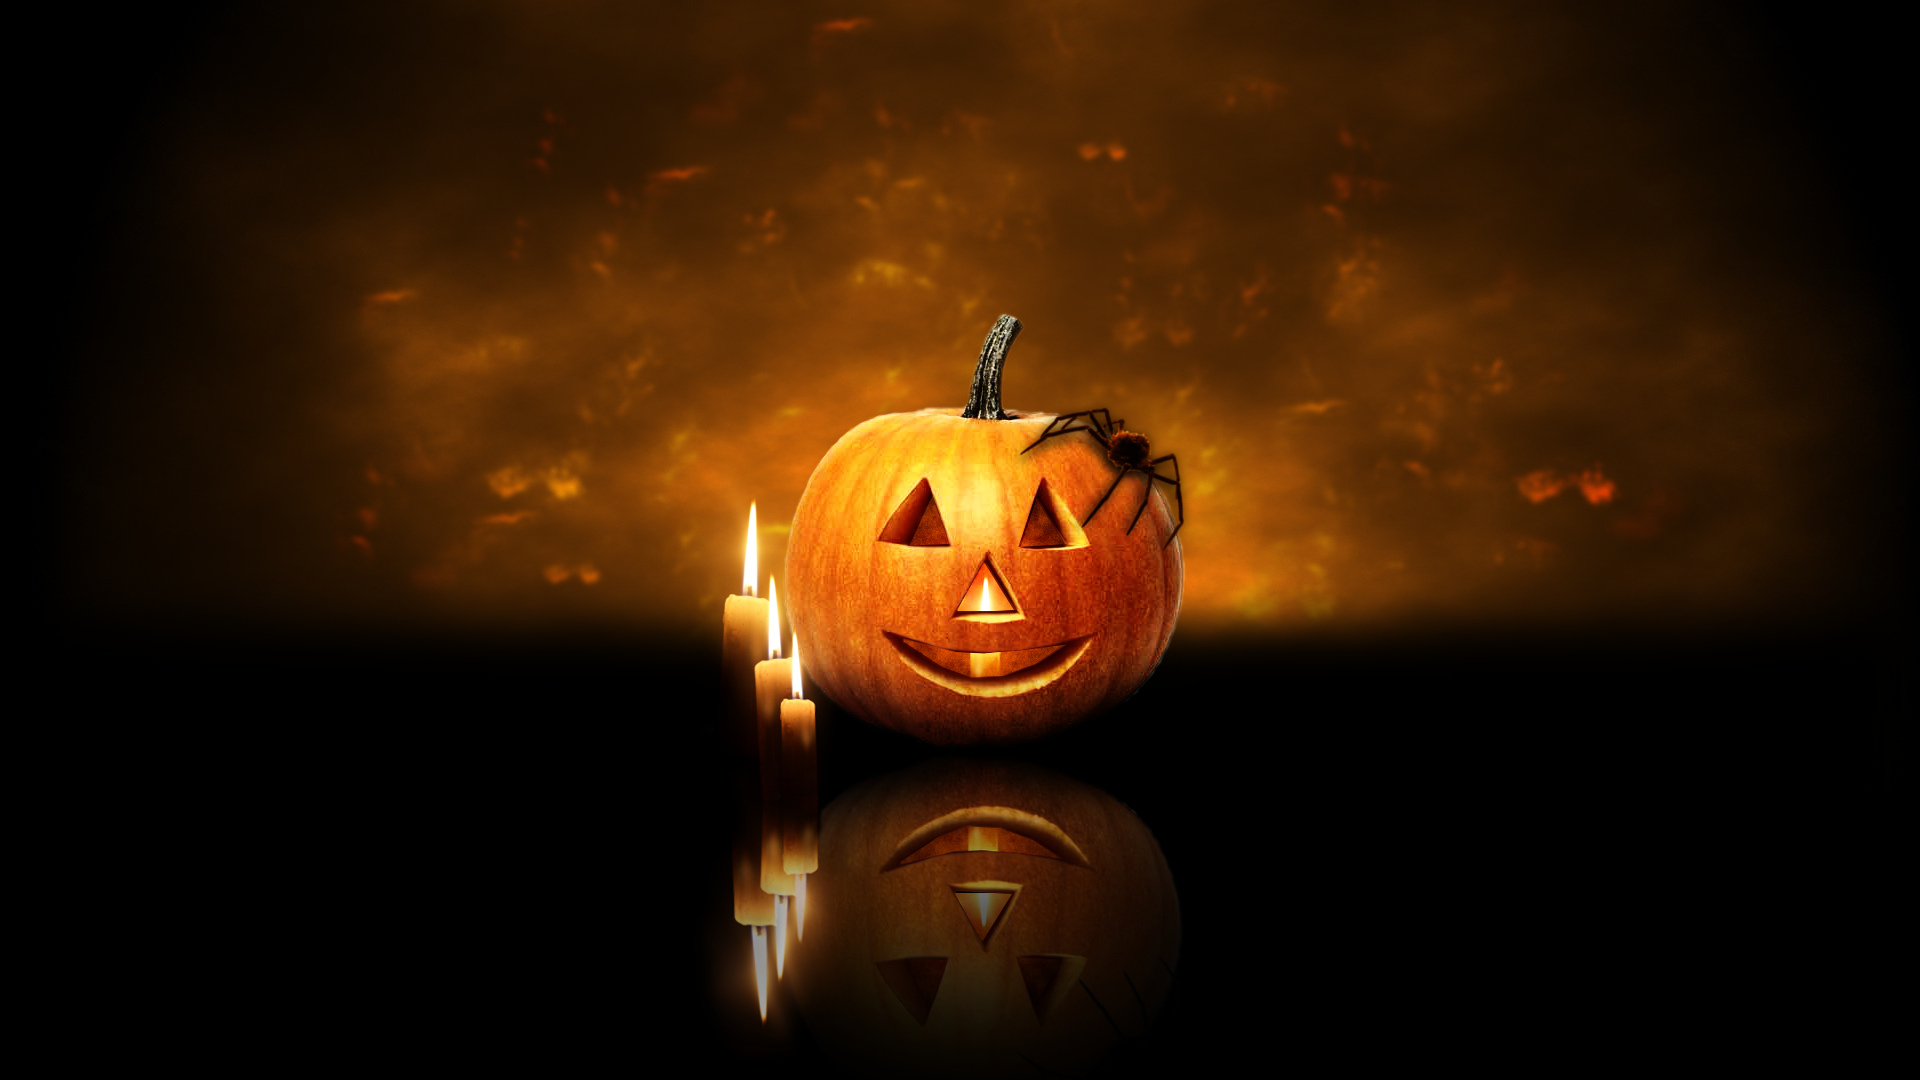 Cute Halloween Desktop wallpaper